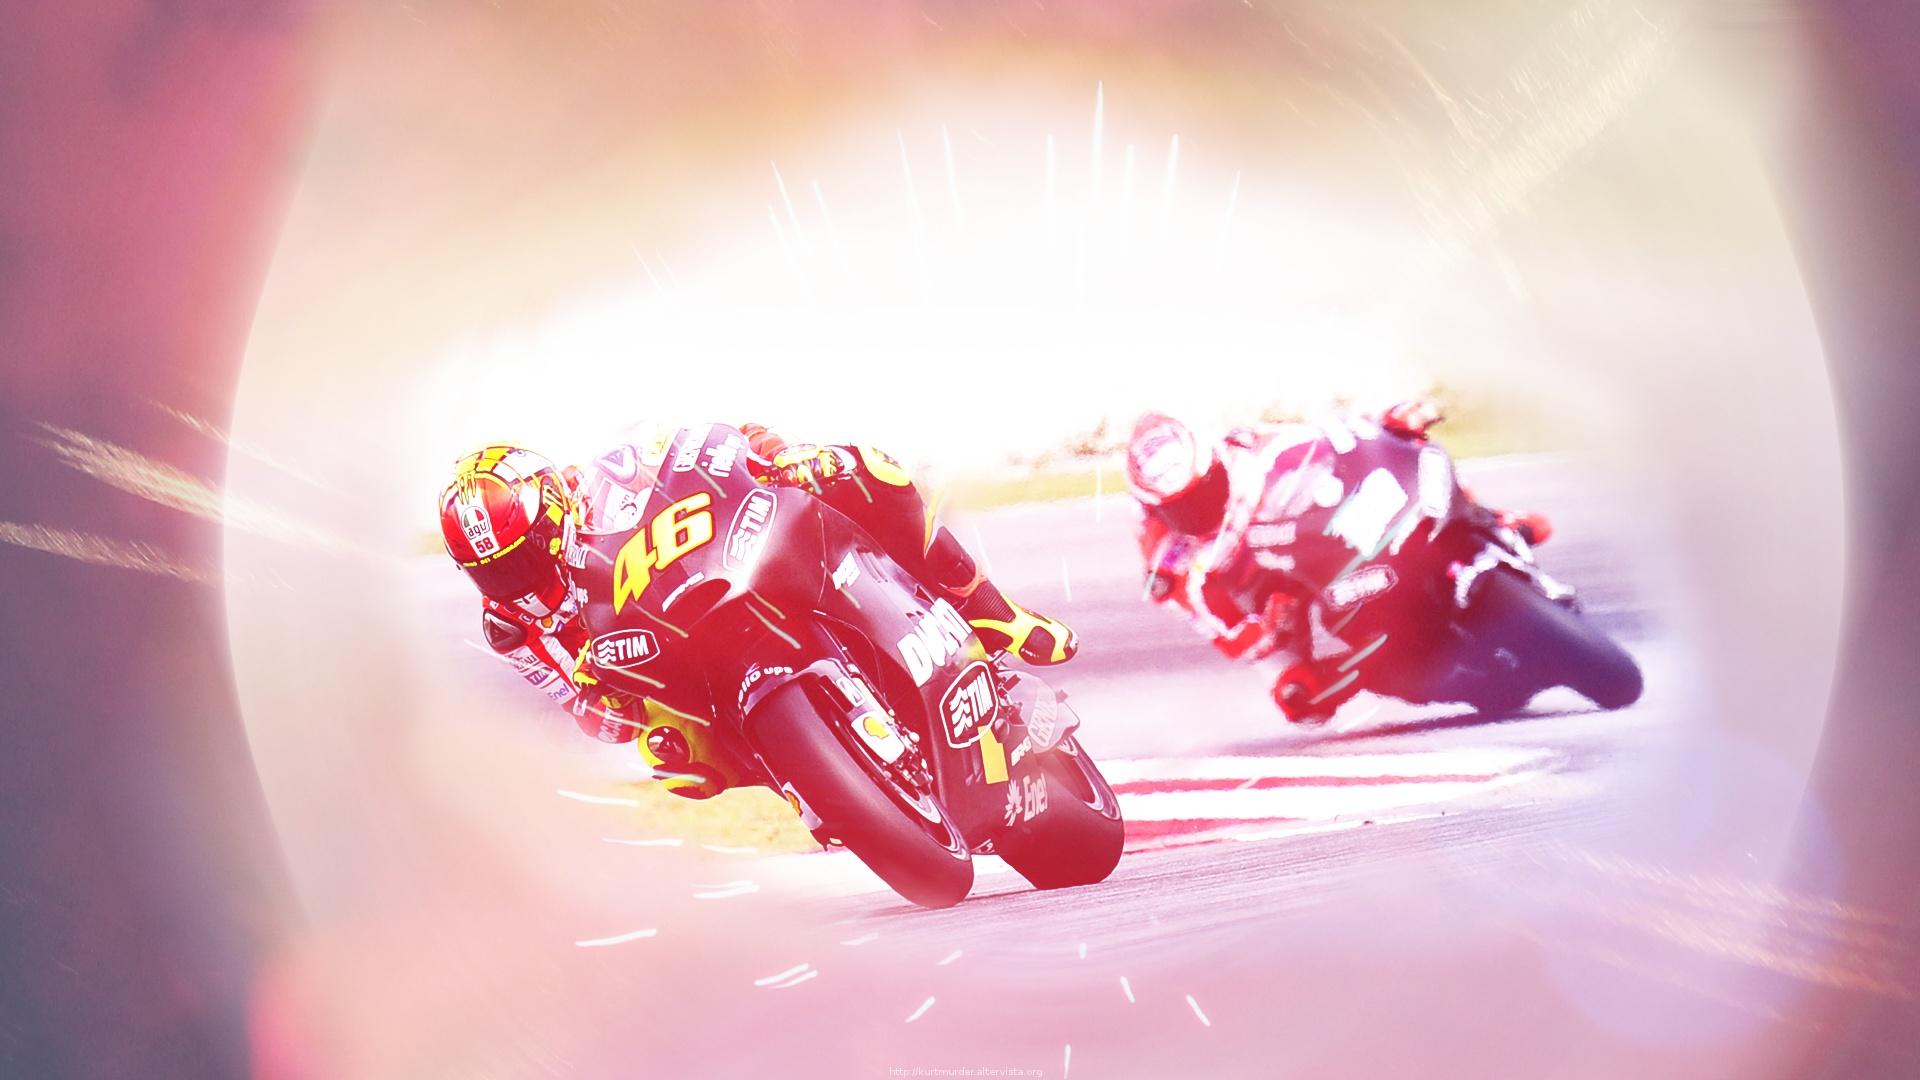 Valentino Rossi n' Nicky Hayden - Ducati Wallpaper by KurtMurder